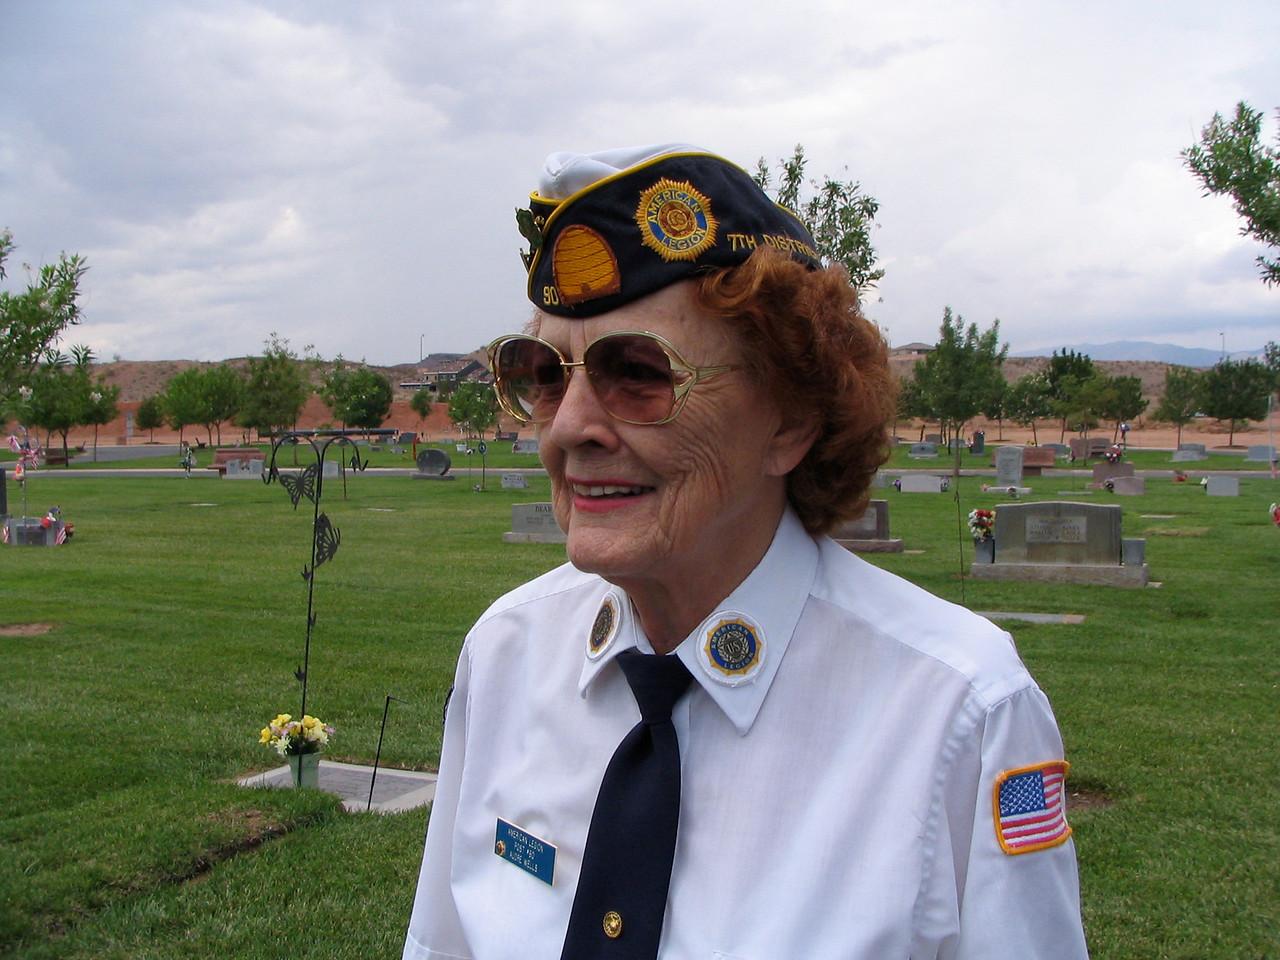 #1 Legionnaire, Audrey Wells, 2007